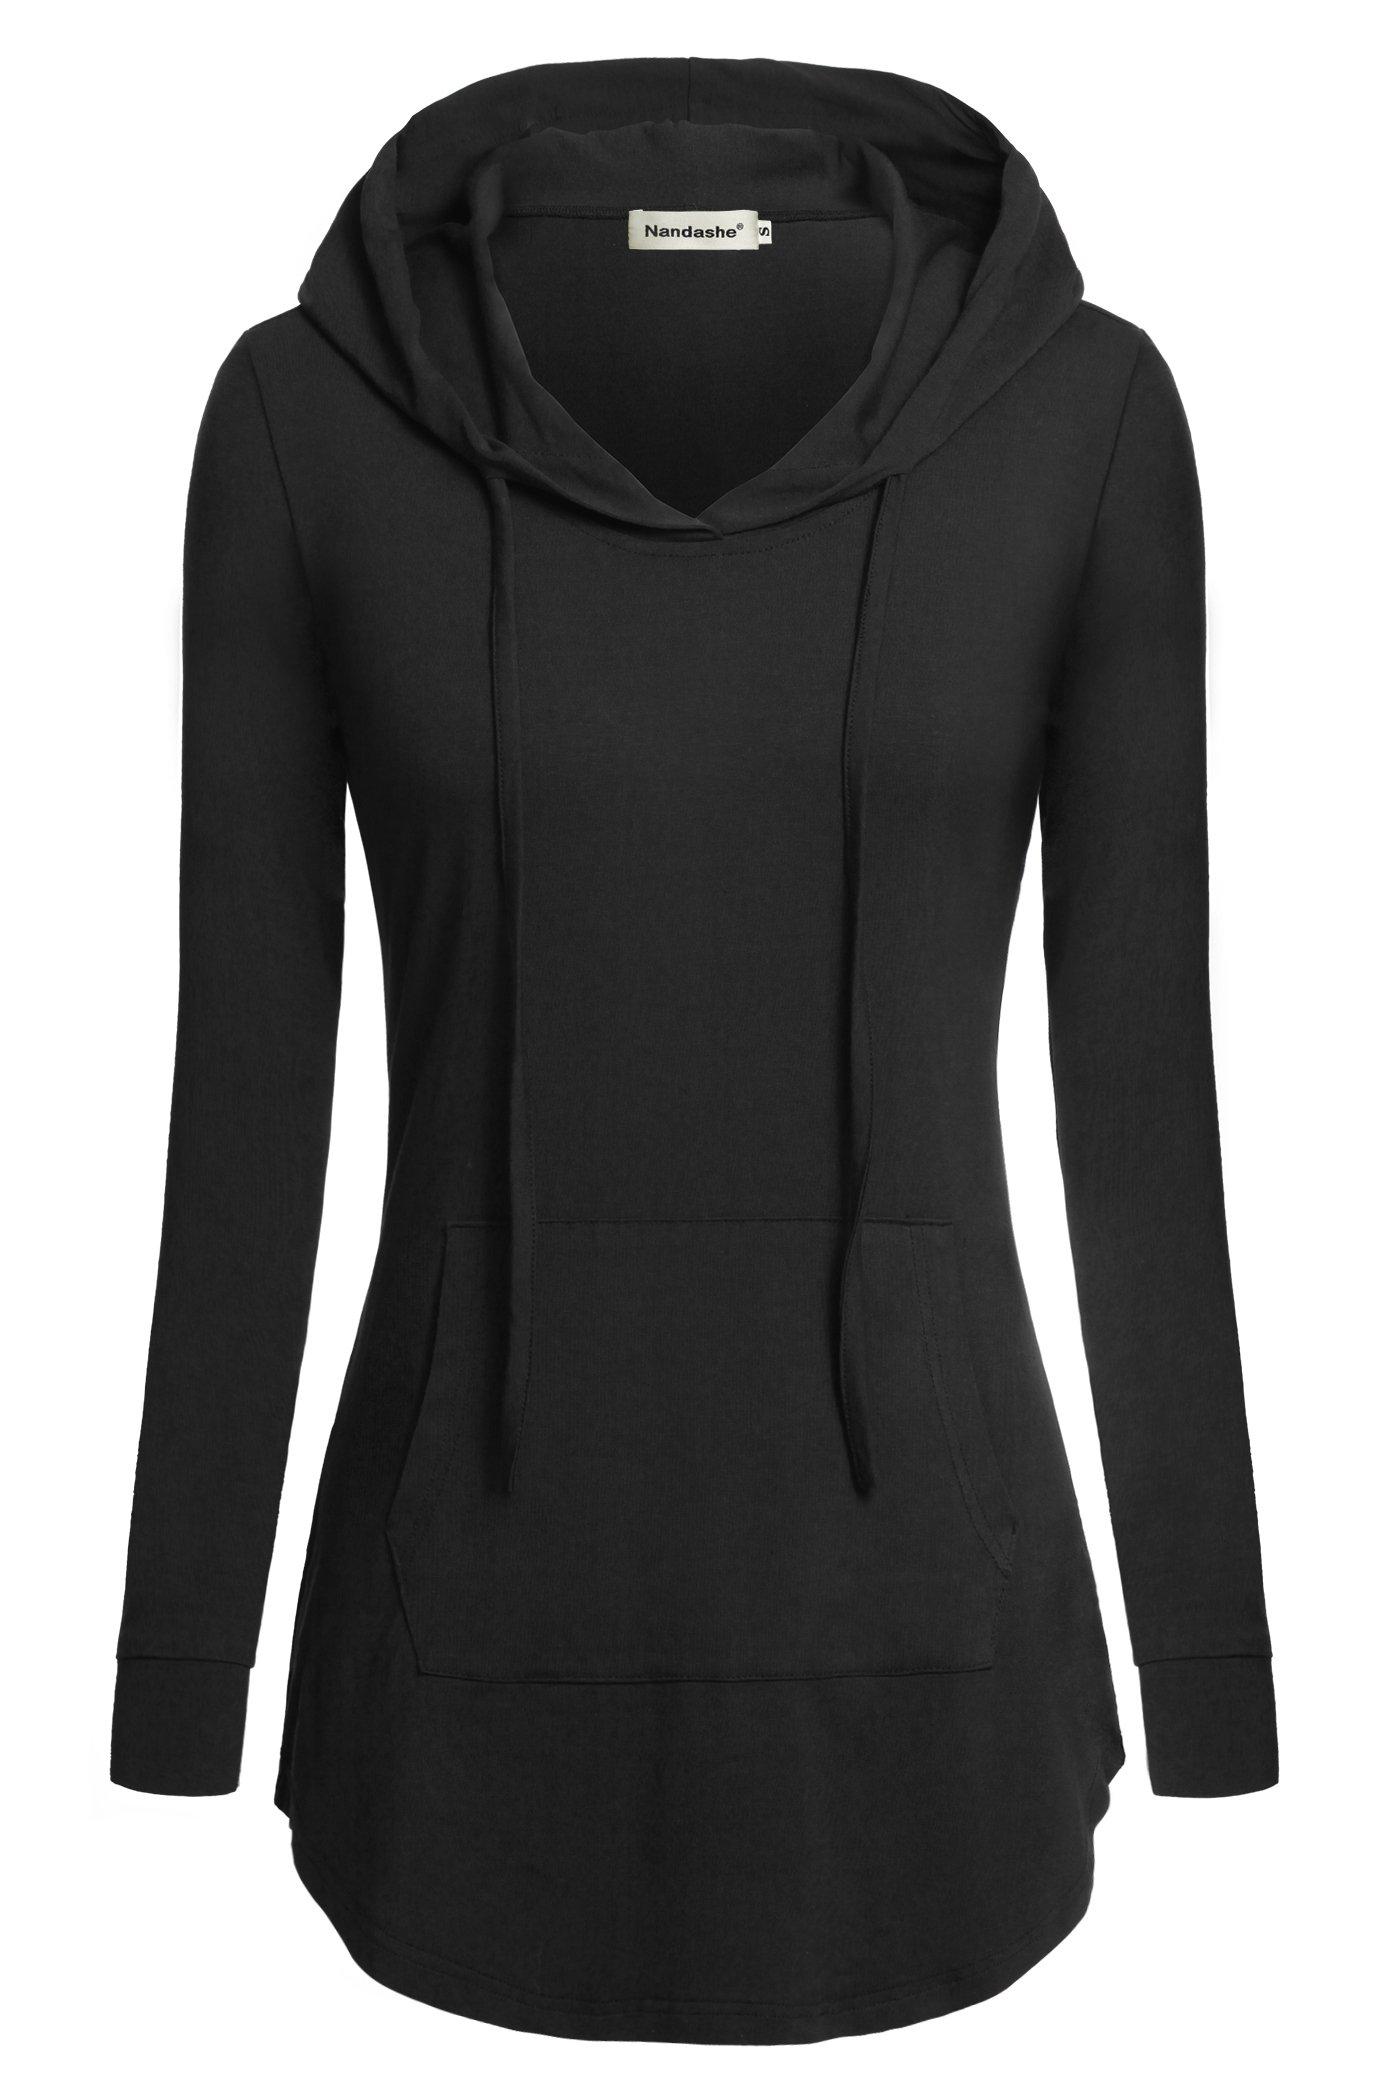 Nandashe Women Hoodies & Sweatshirts, Ladies Elegant Mock Neck Long Sleeve Professional Formal Company Business Office Shirts for Work Special Occasions with Kangaroo Pocket Black Large US Size 10-14